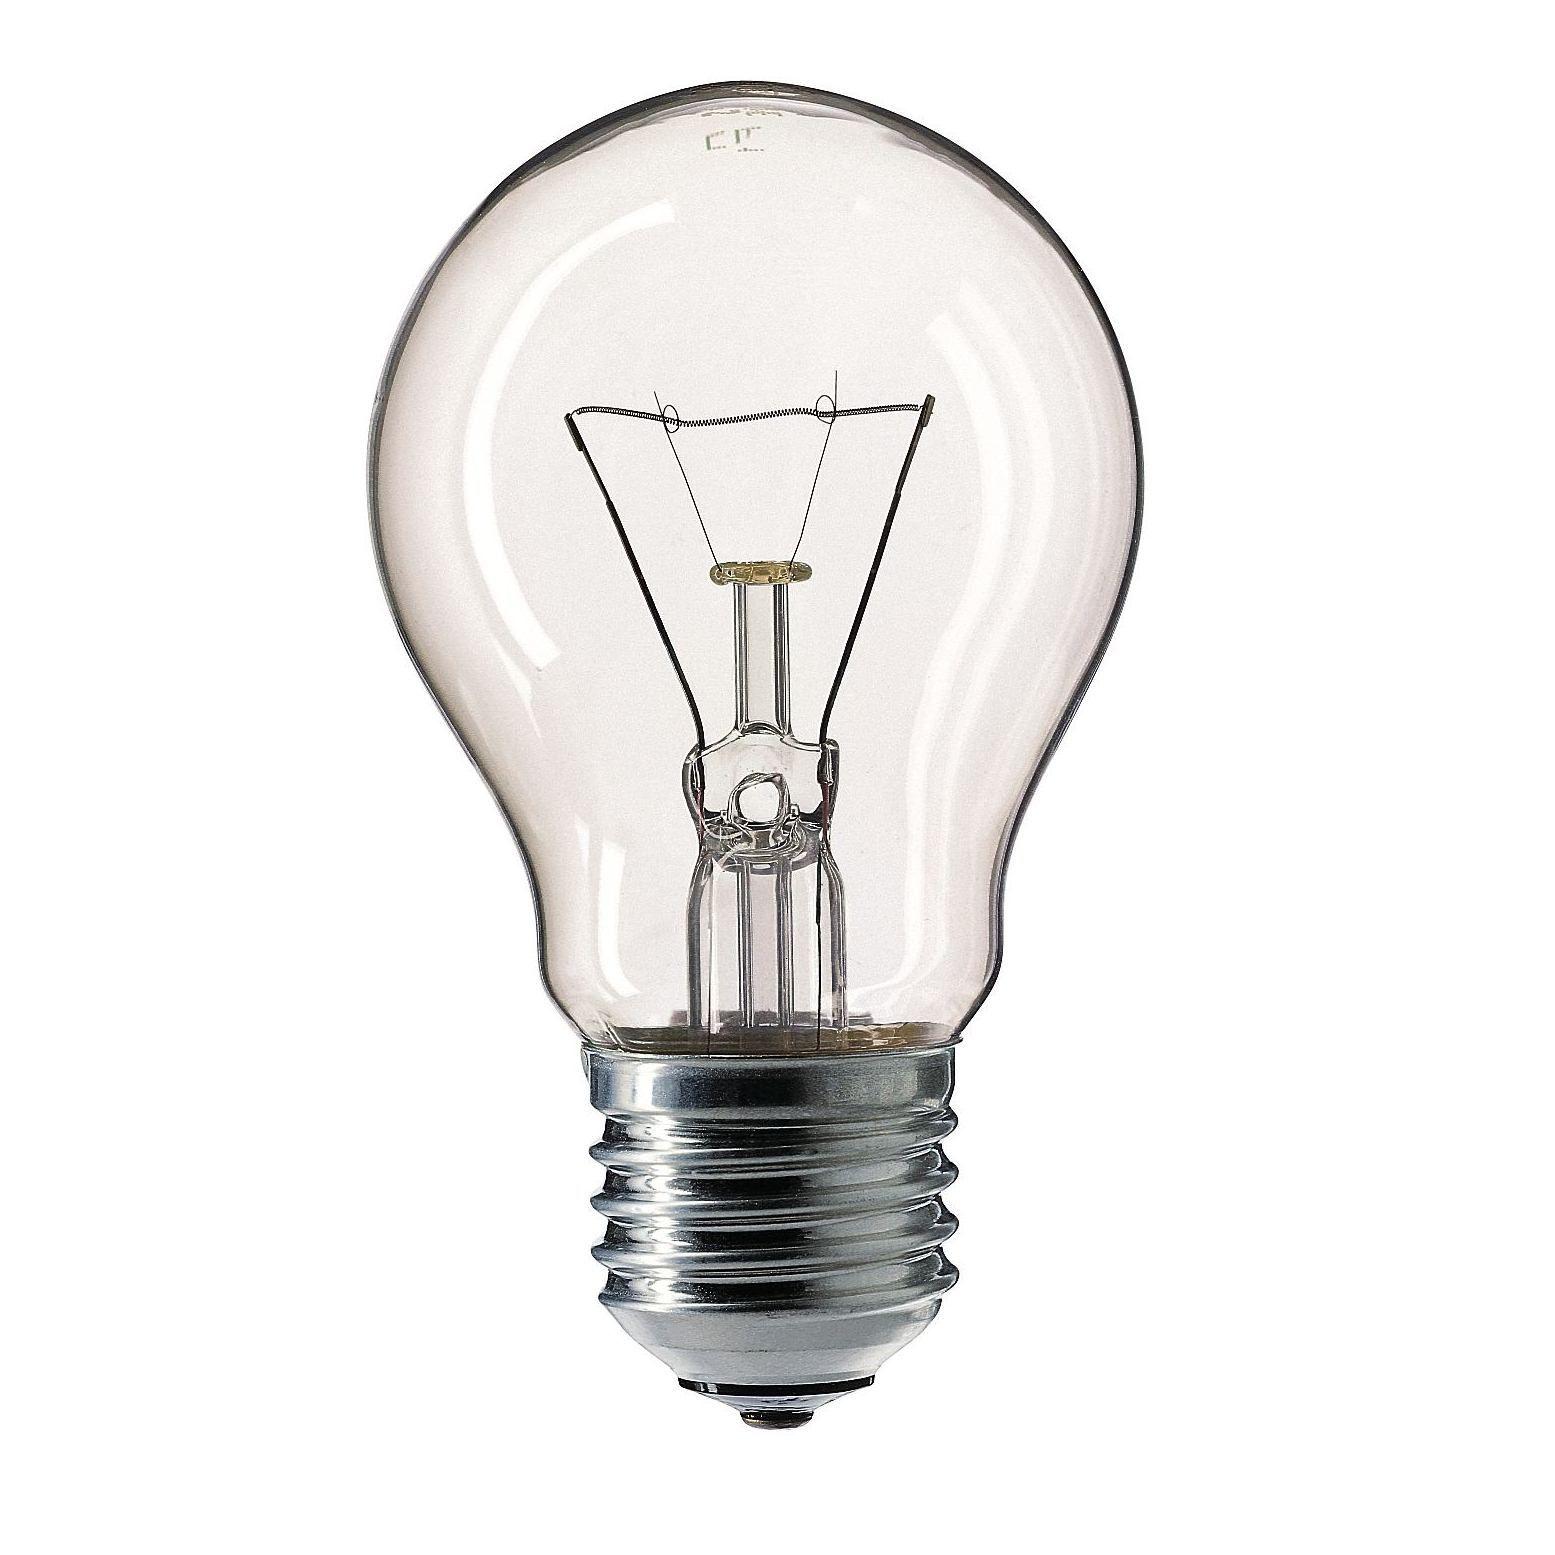 Купить Лампа накаливания Philips STANDARD 60W E27 230V A55 CL 1CT/12X10F Pila прозрачна